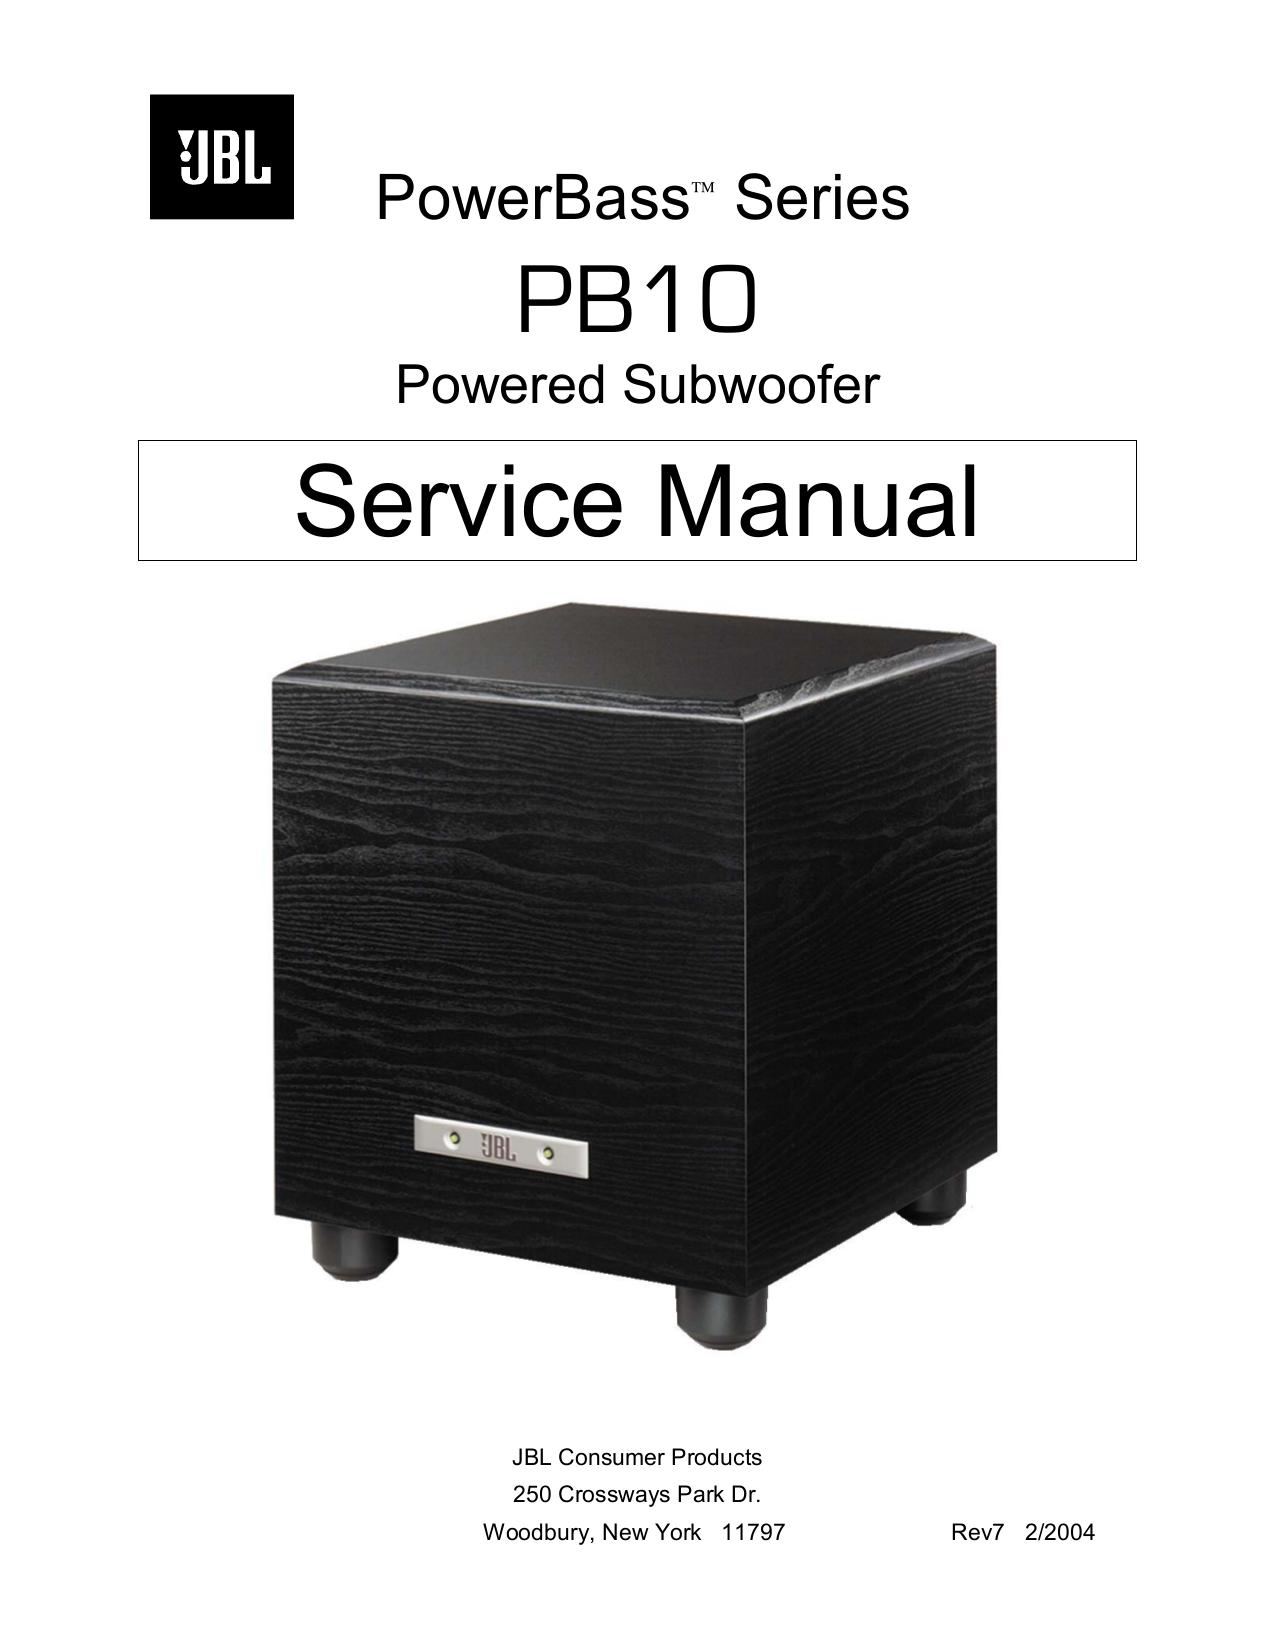 download free pdf for jbl pb10 subwoofer manual rh umlib com jbl pb10 subwoofer specs JBL Sub 160 Service Manual